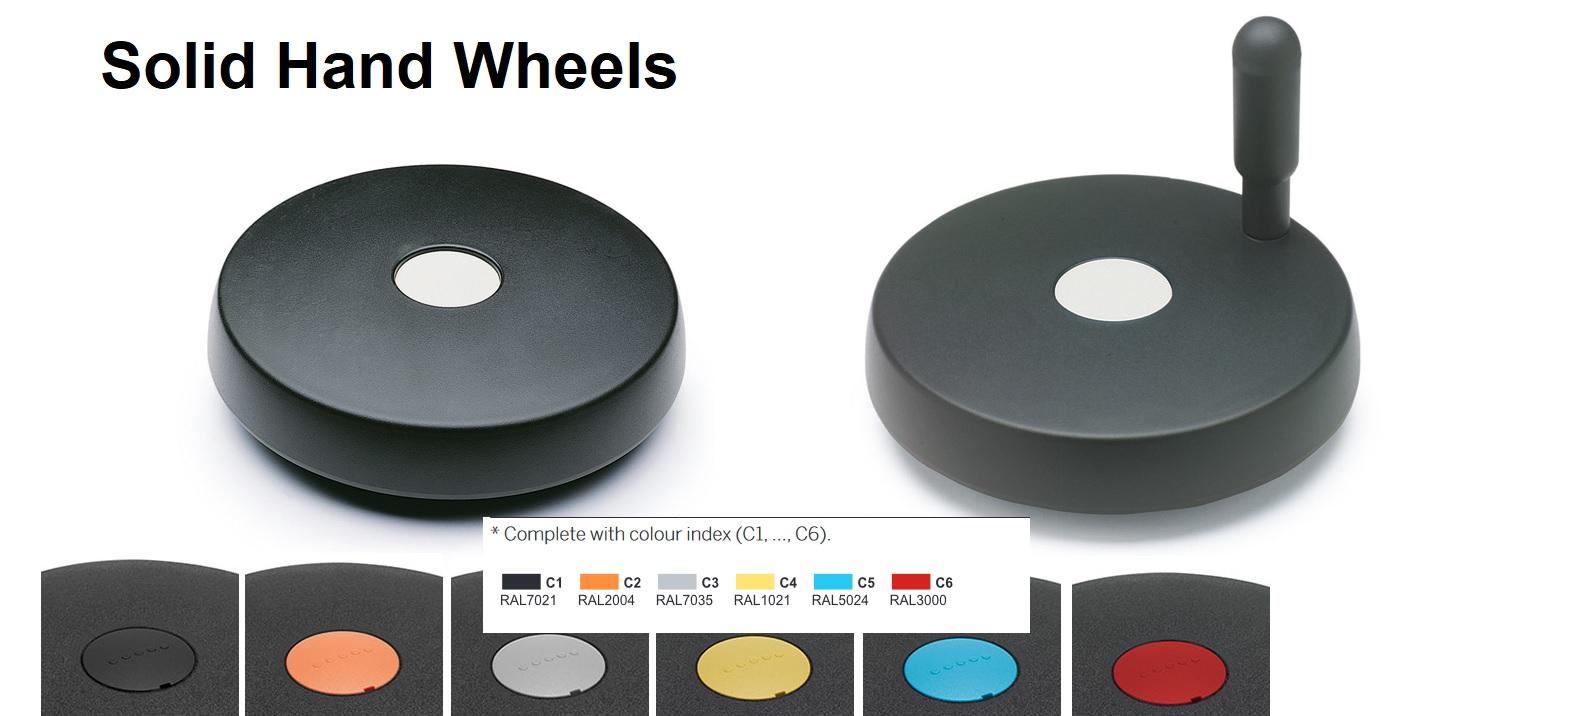 Solid handwheels